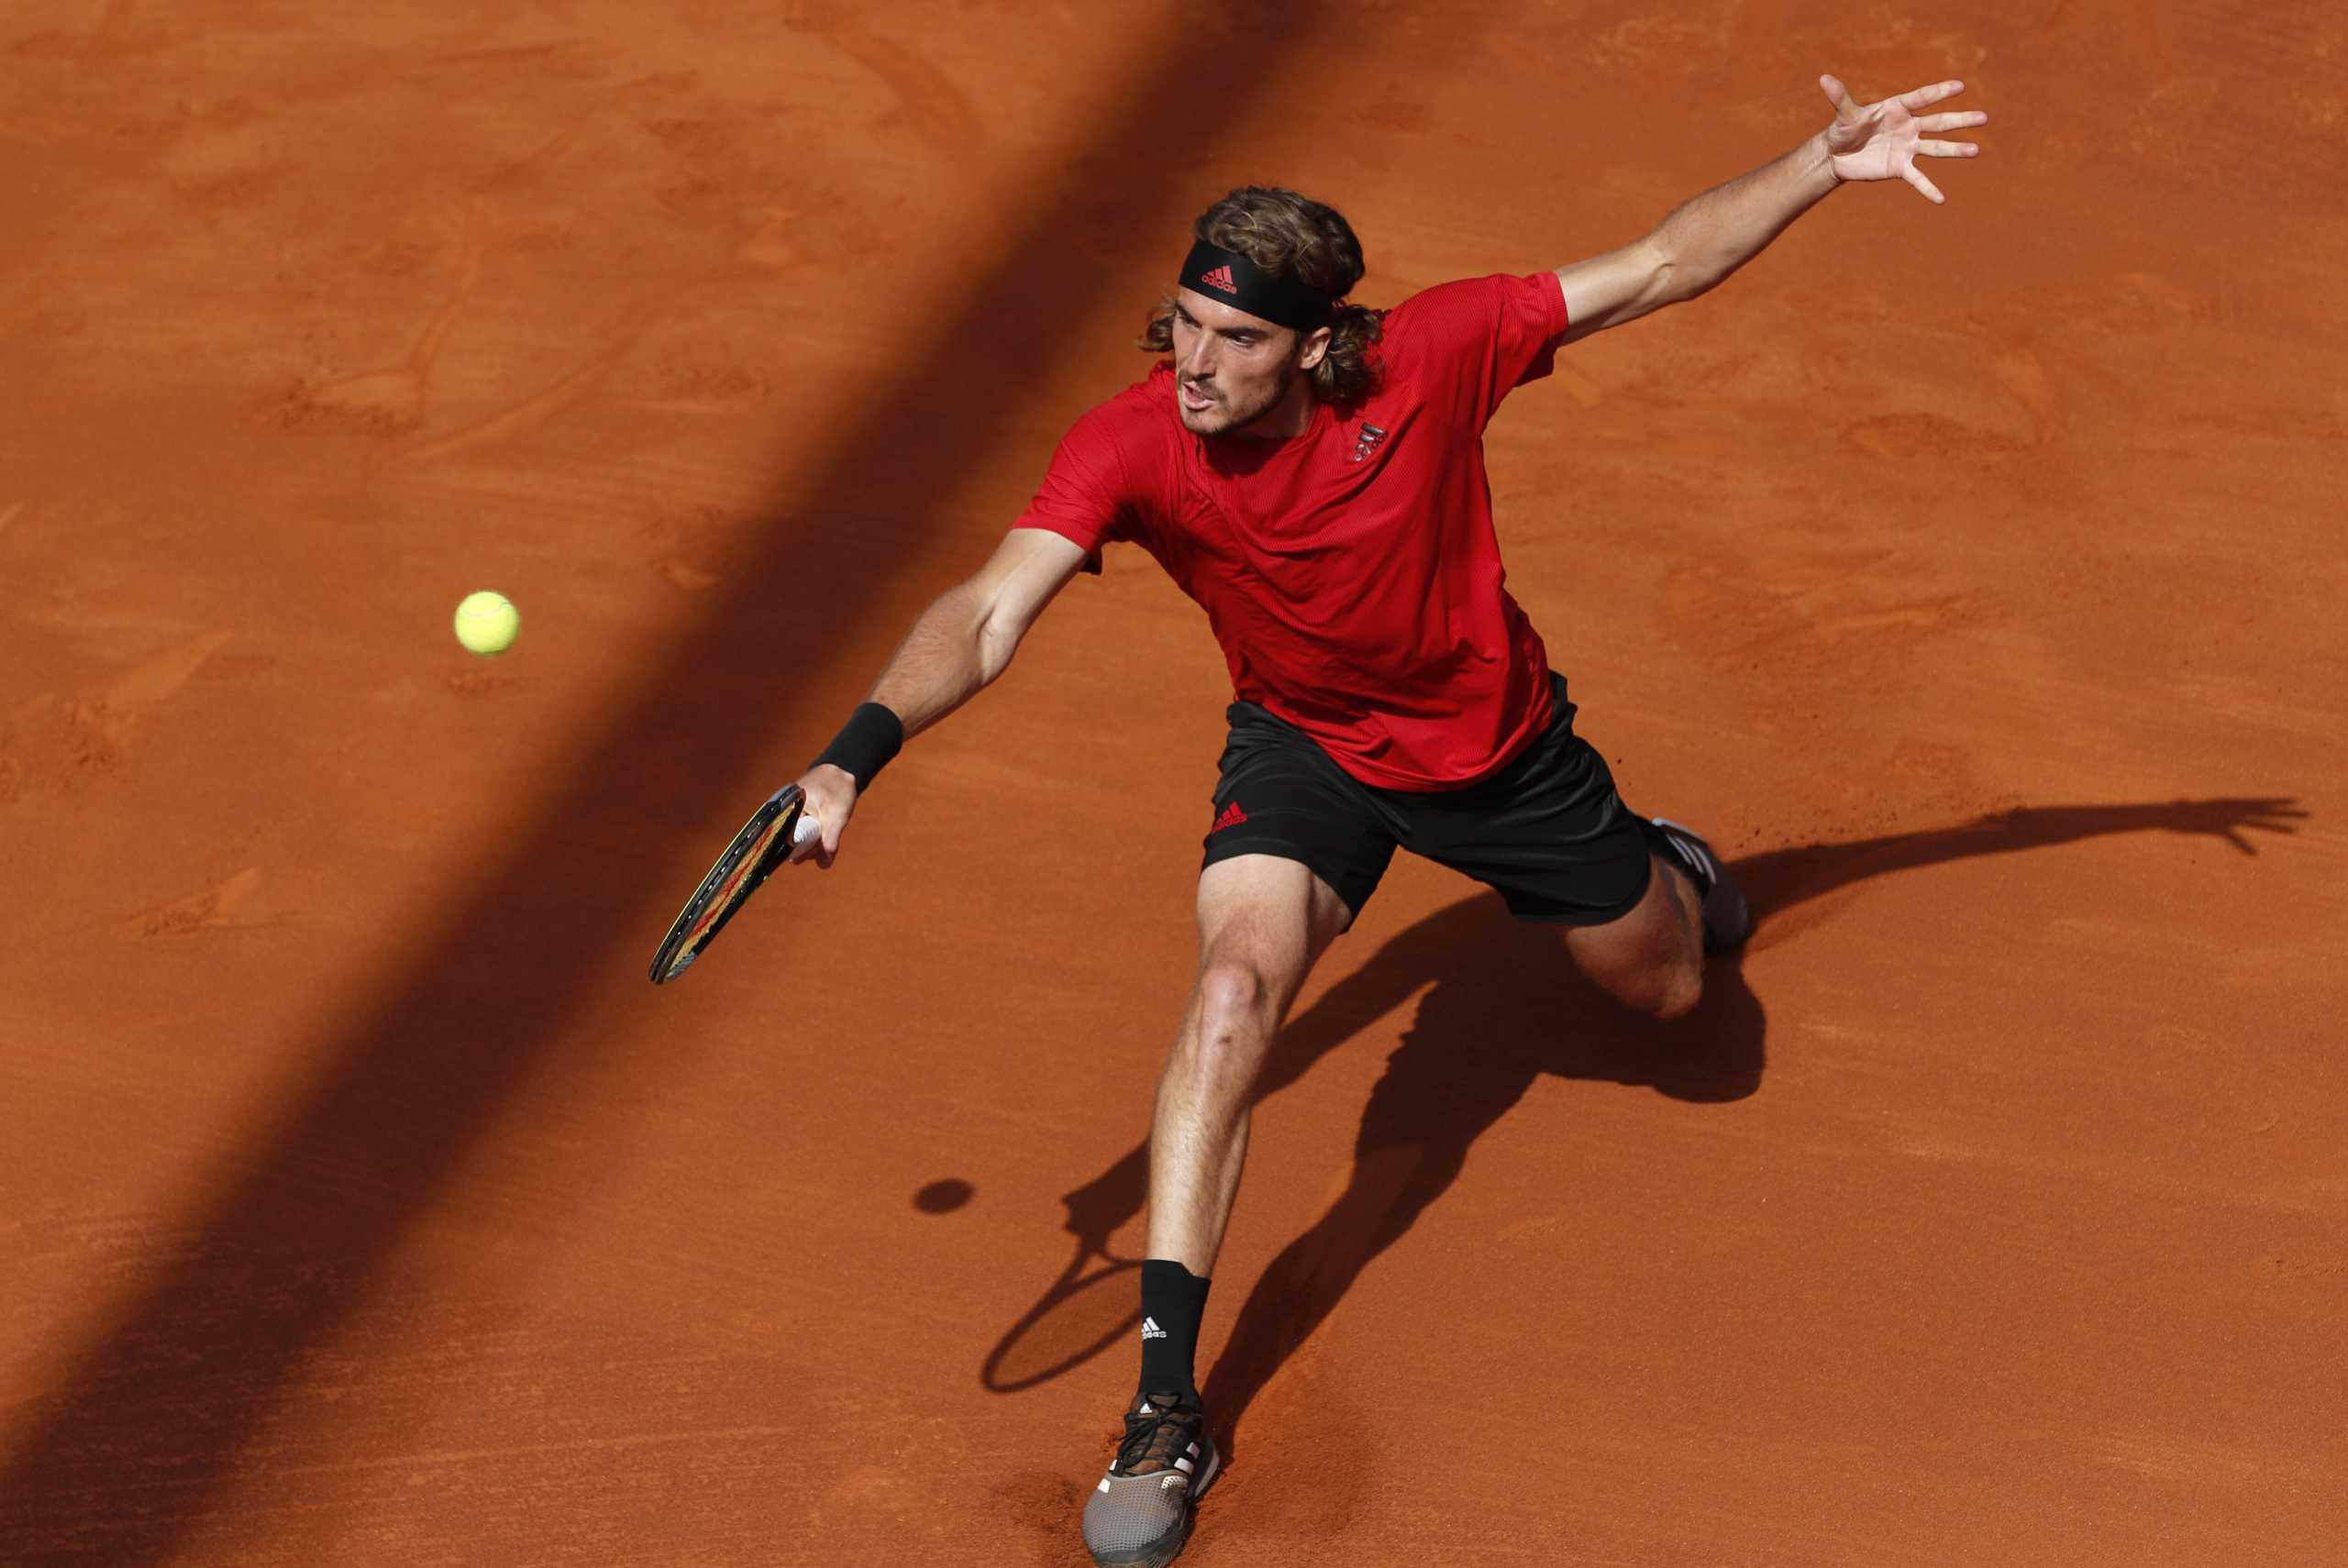 Roland Garros: Ρίχνεται στη «μάχη» ο Τσιτσιπάς